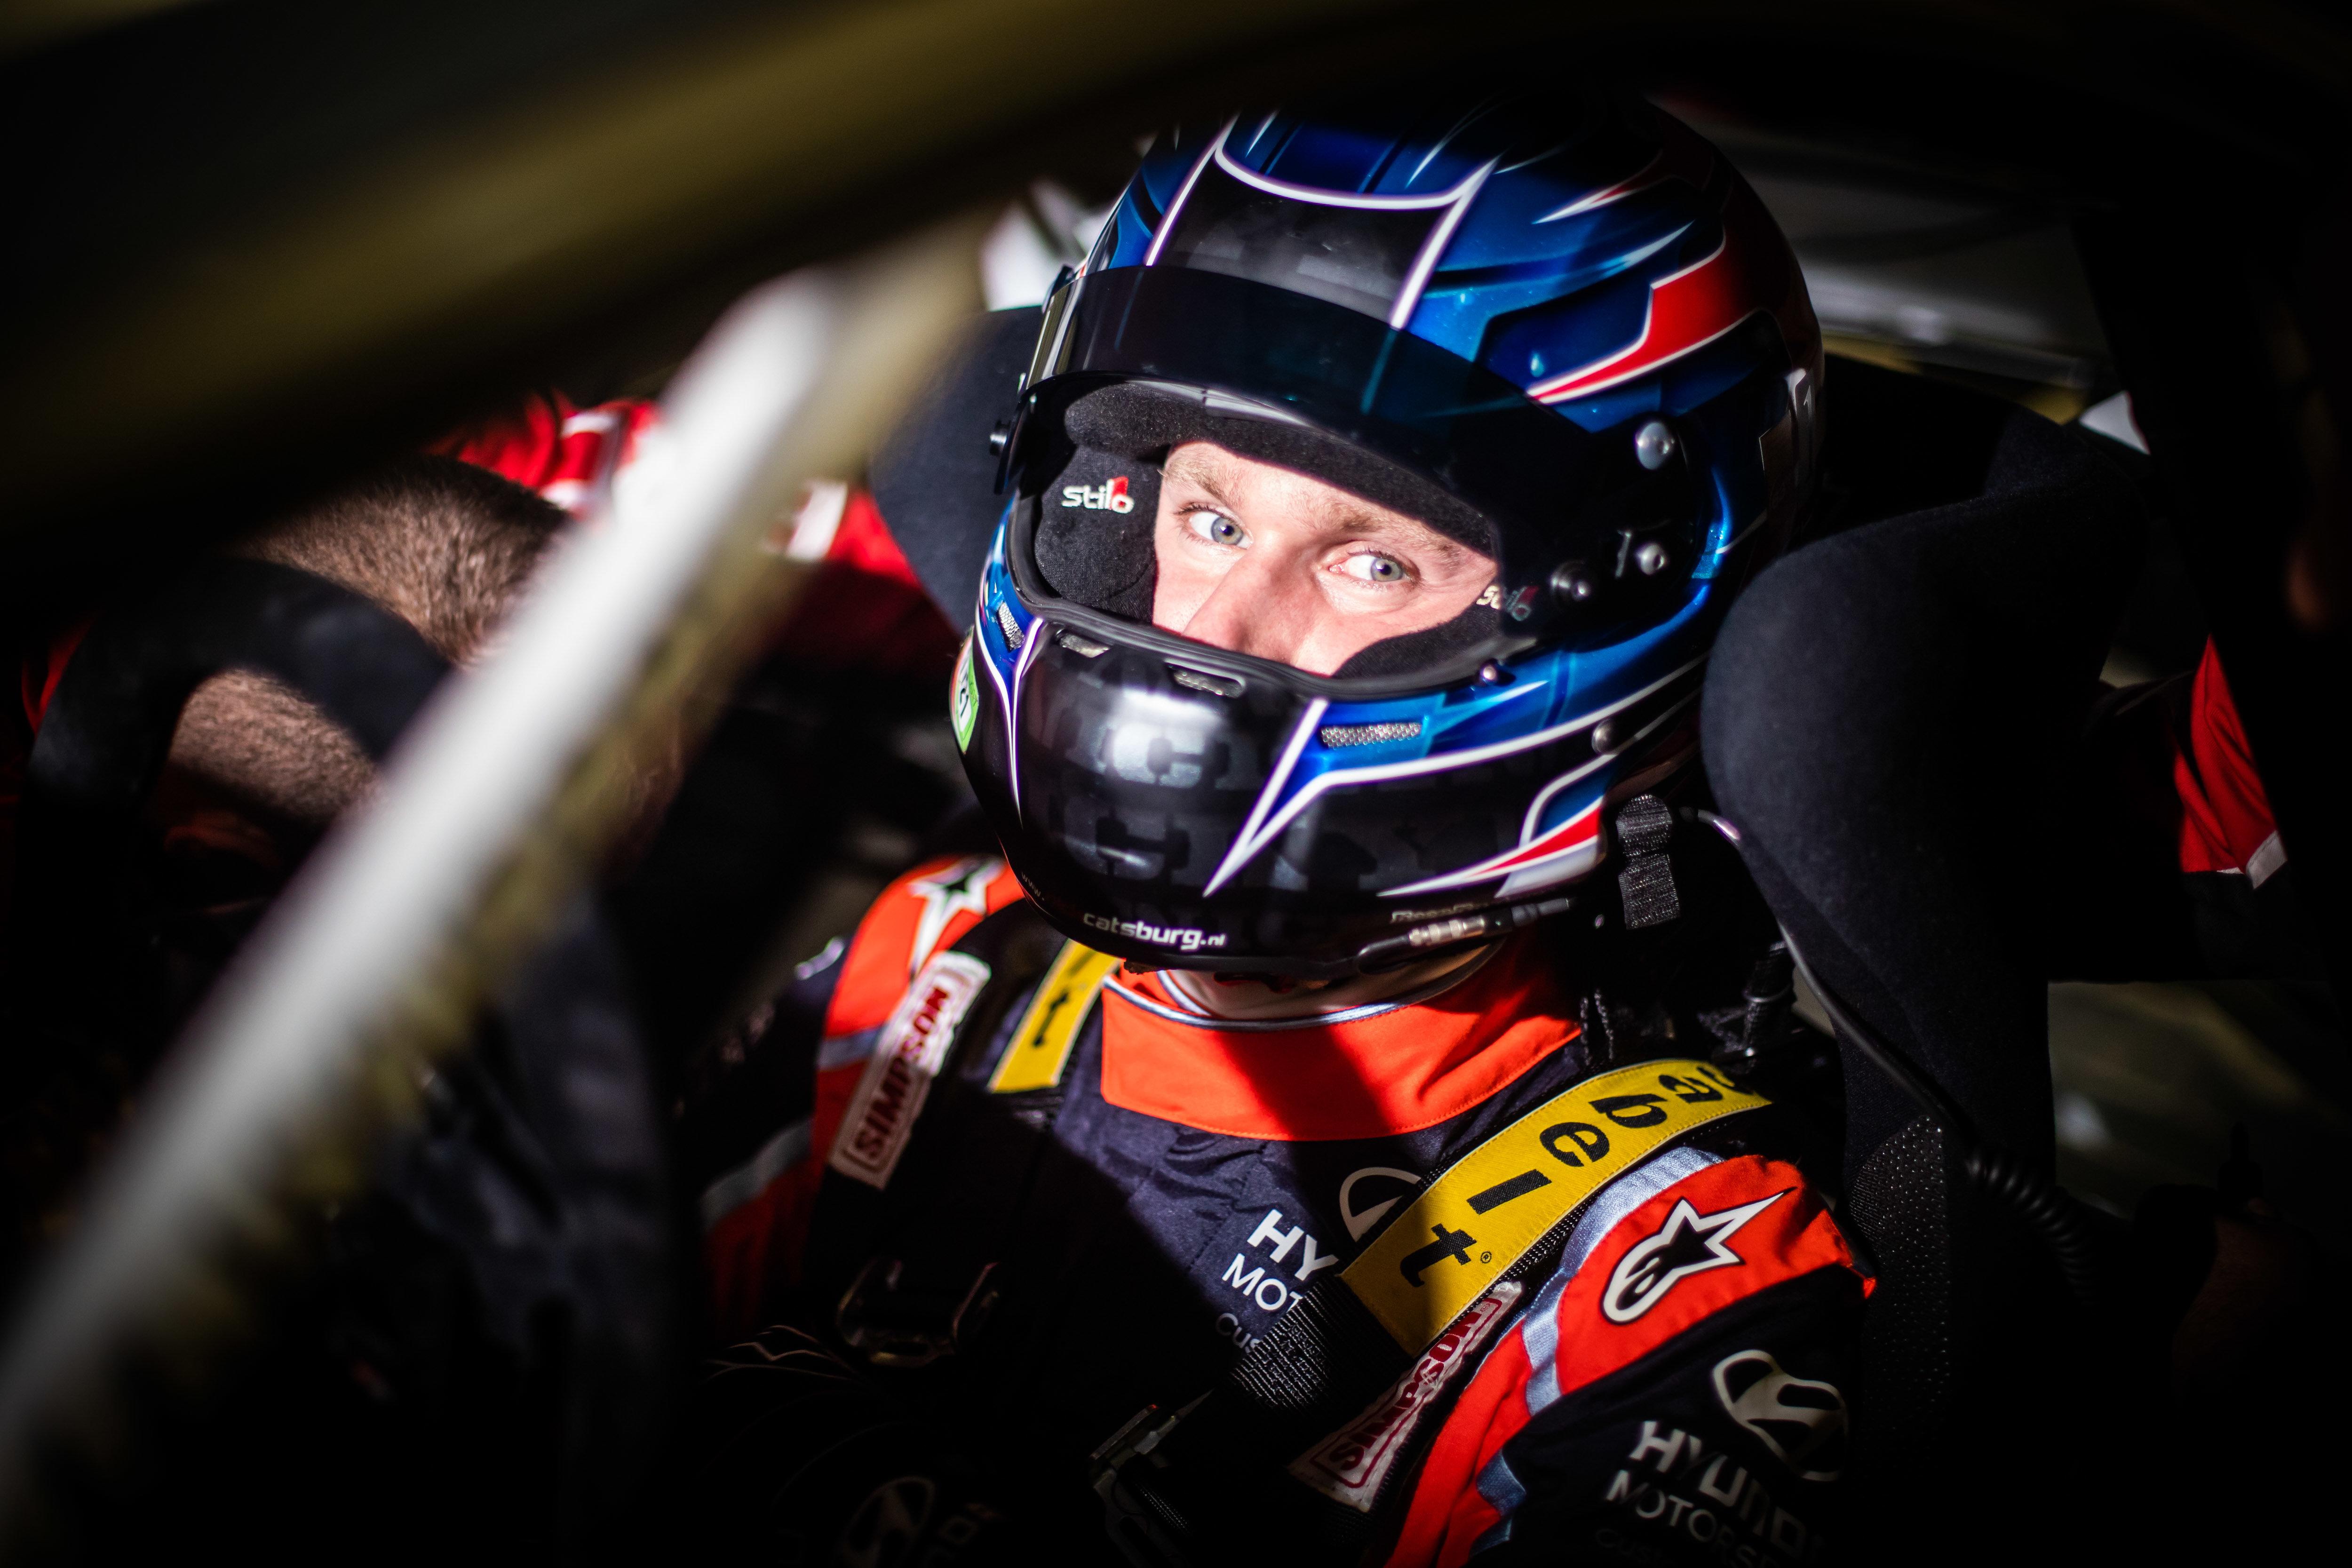 Nicky Catsburg - i30 N TCR - Portimao Test